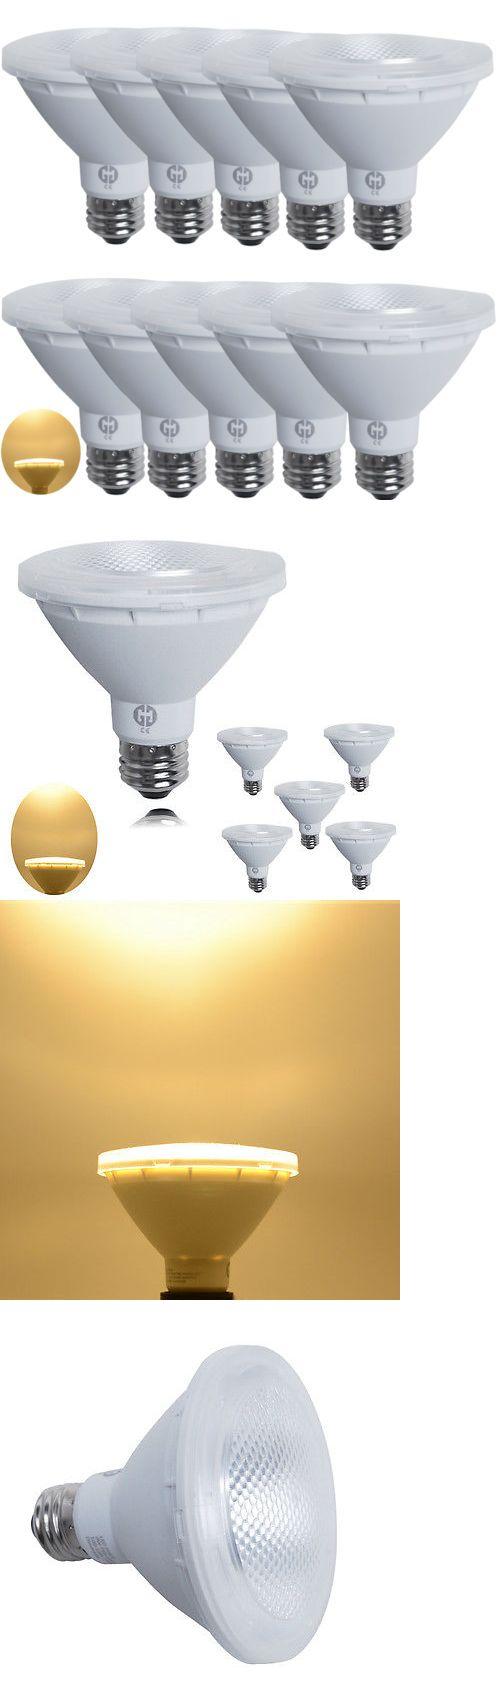 Light Bulbs 20706 10 Pack Bright 9W Par30 E26 Led Spotlight Lamp